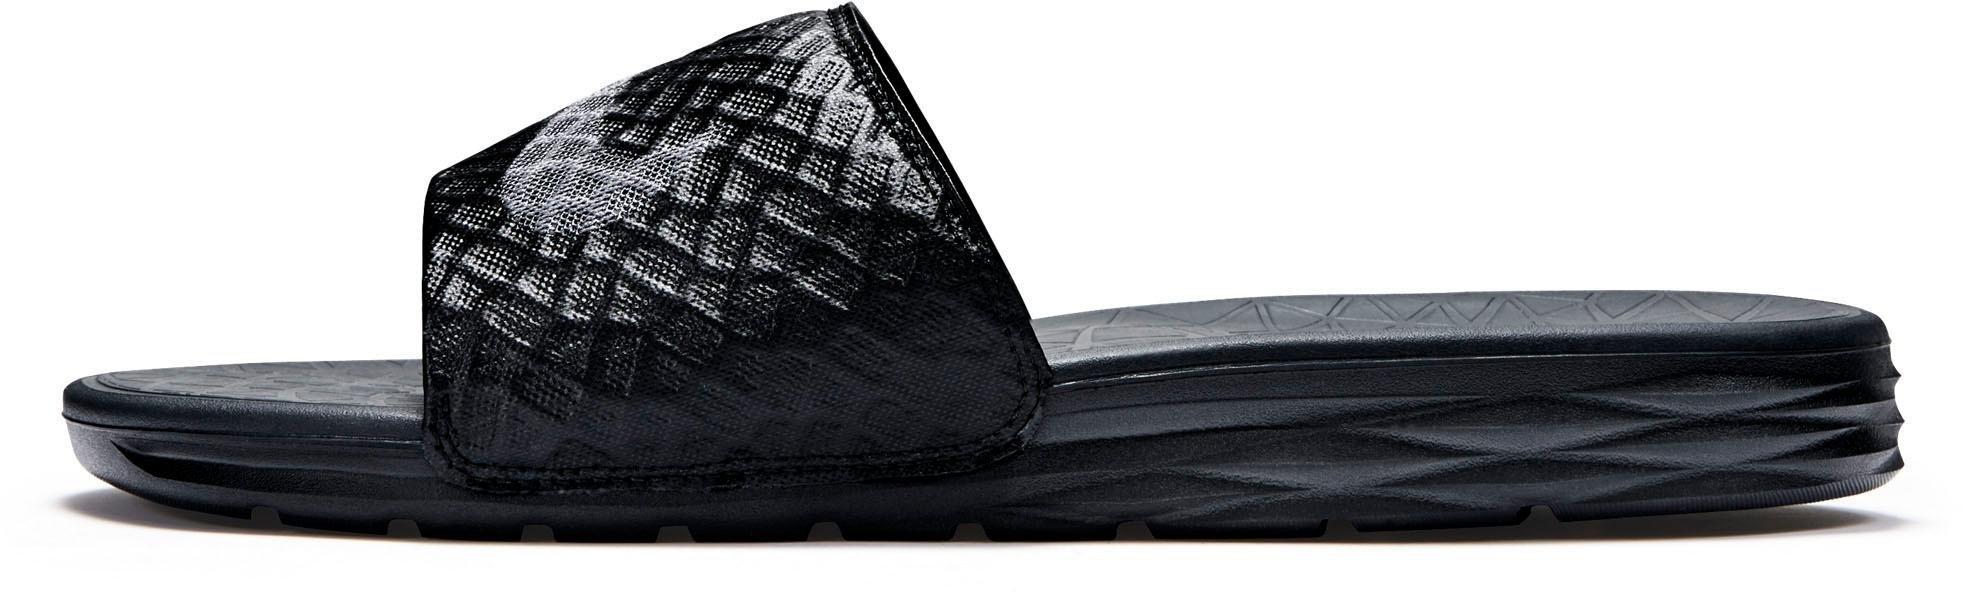 Nike Sportswear badslippers »Benassi Solarsoft« nu online kopen bij OTTO